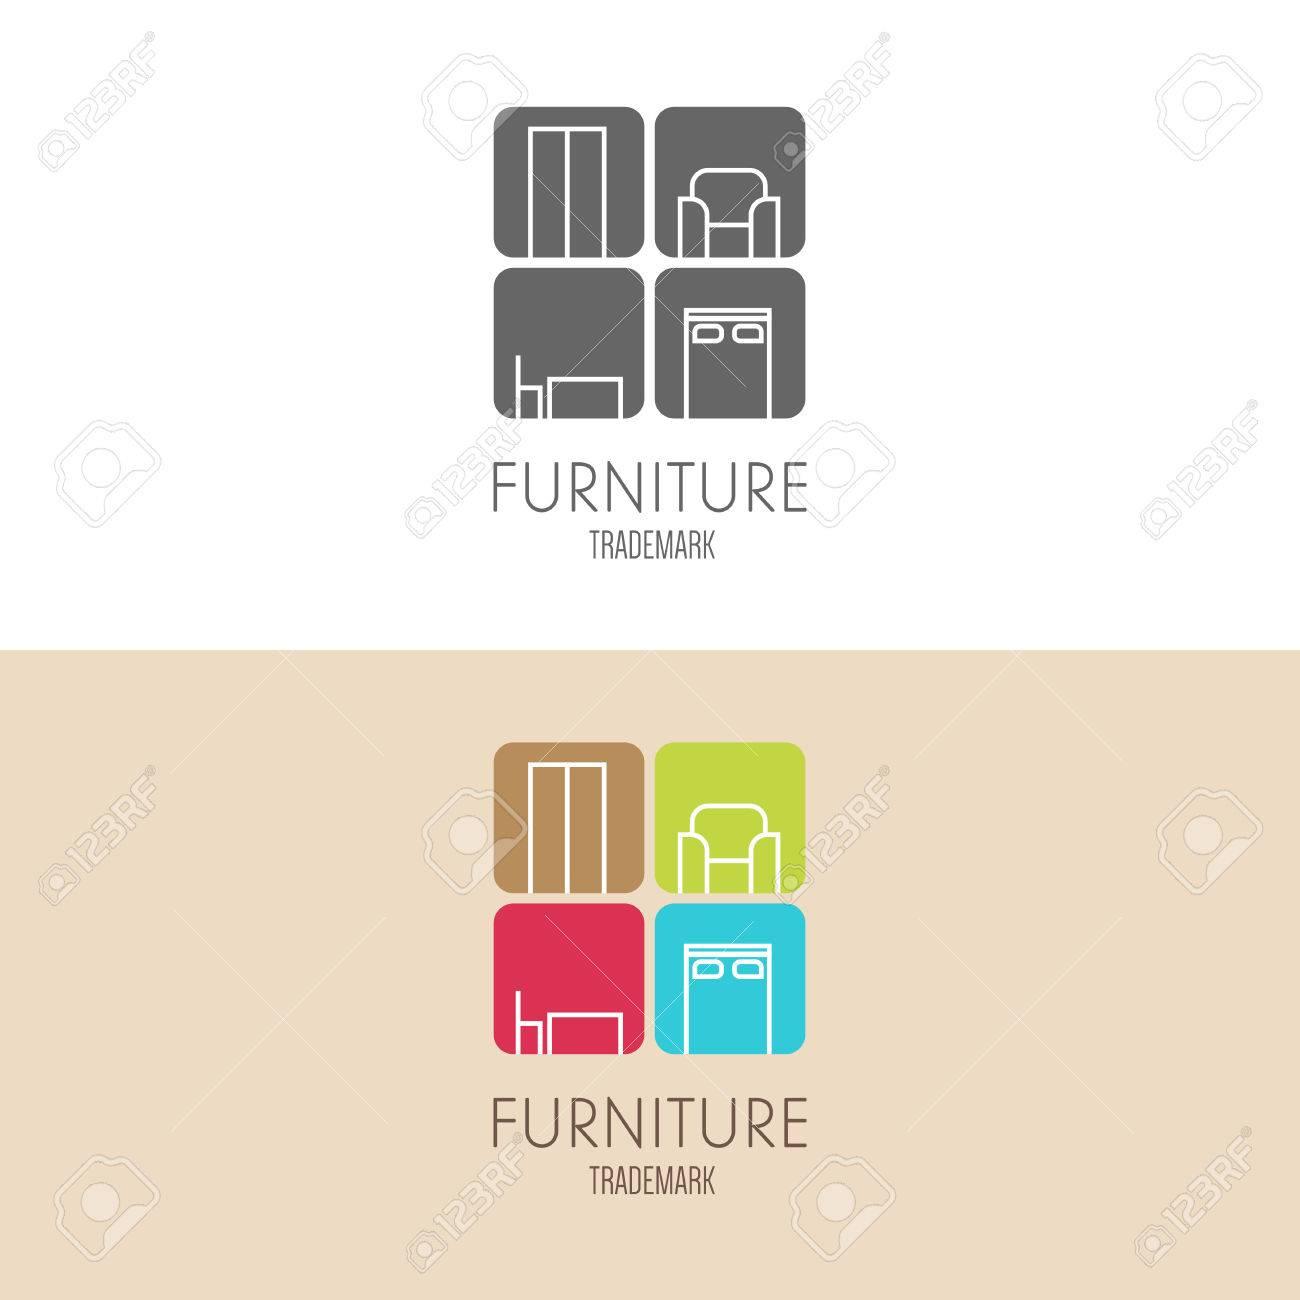 Furniture logo inspiration - Vector Label Inspiration With Furniture